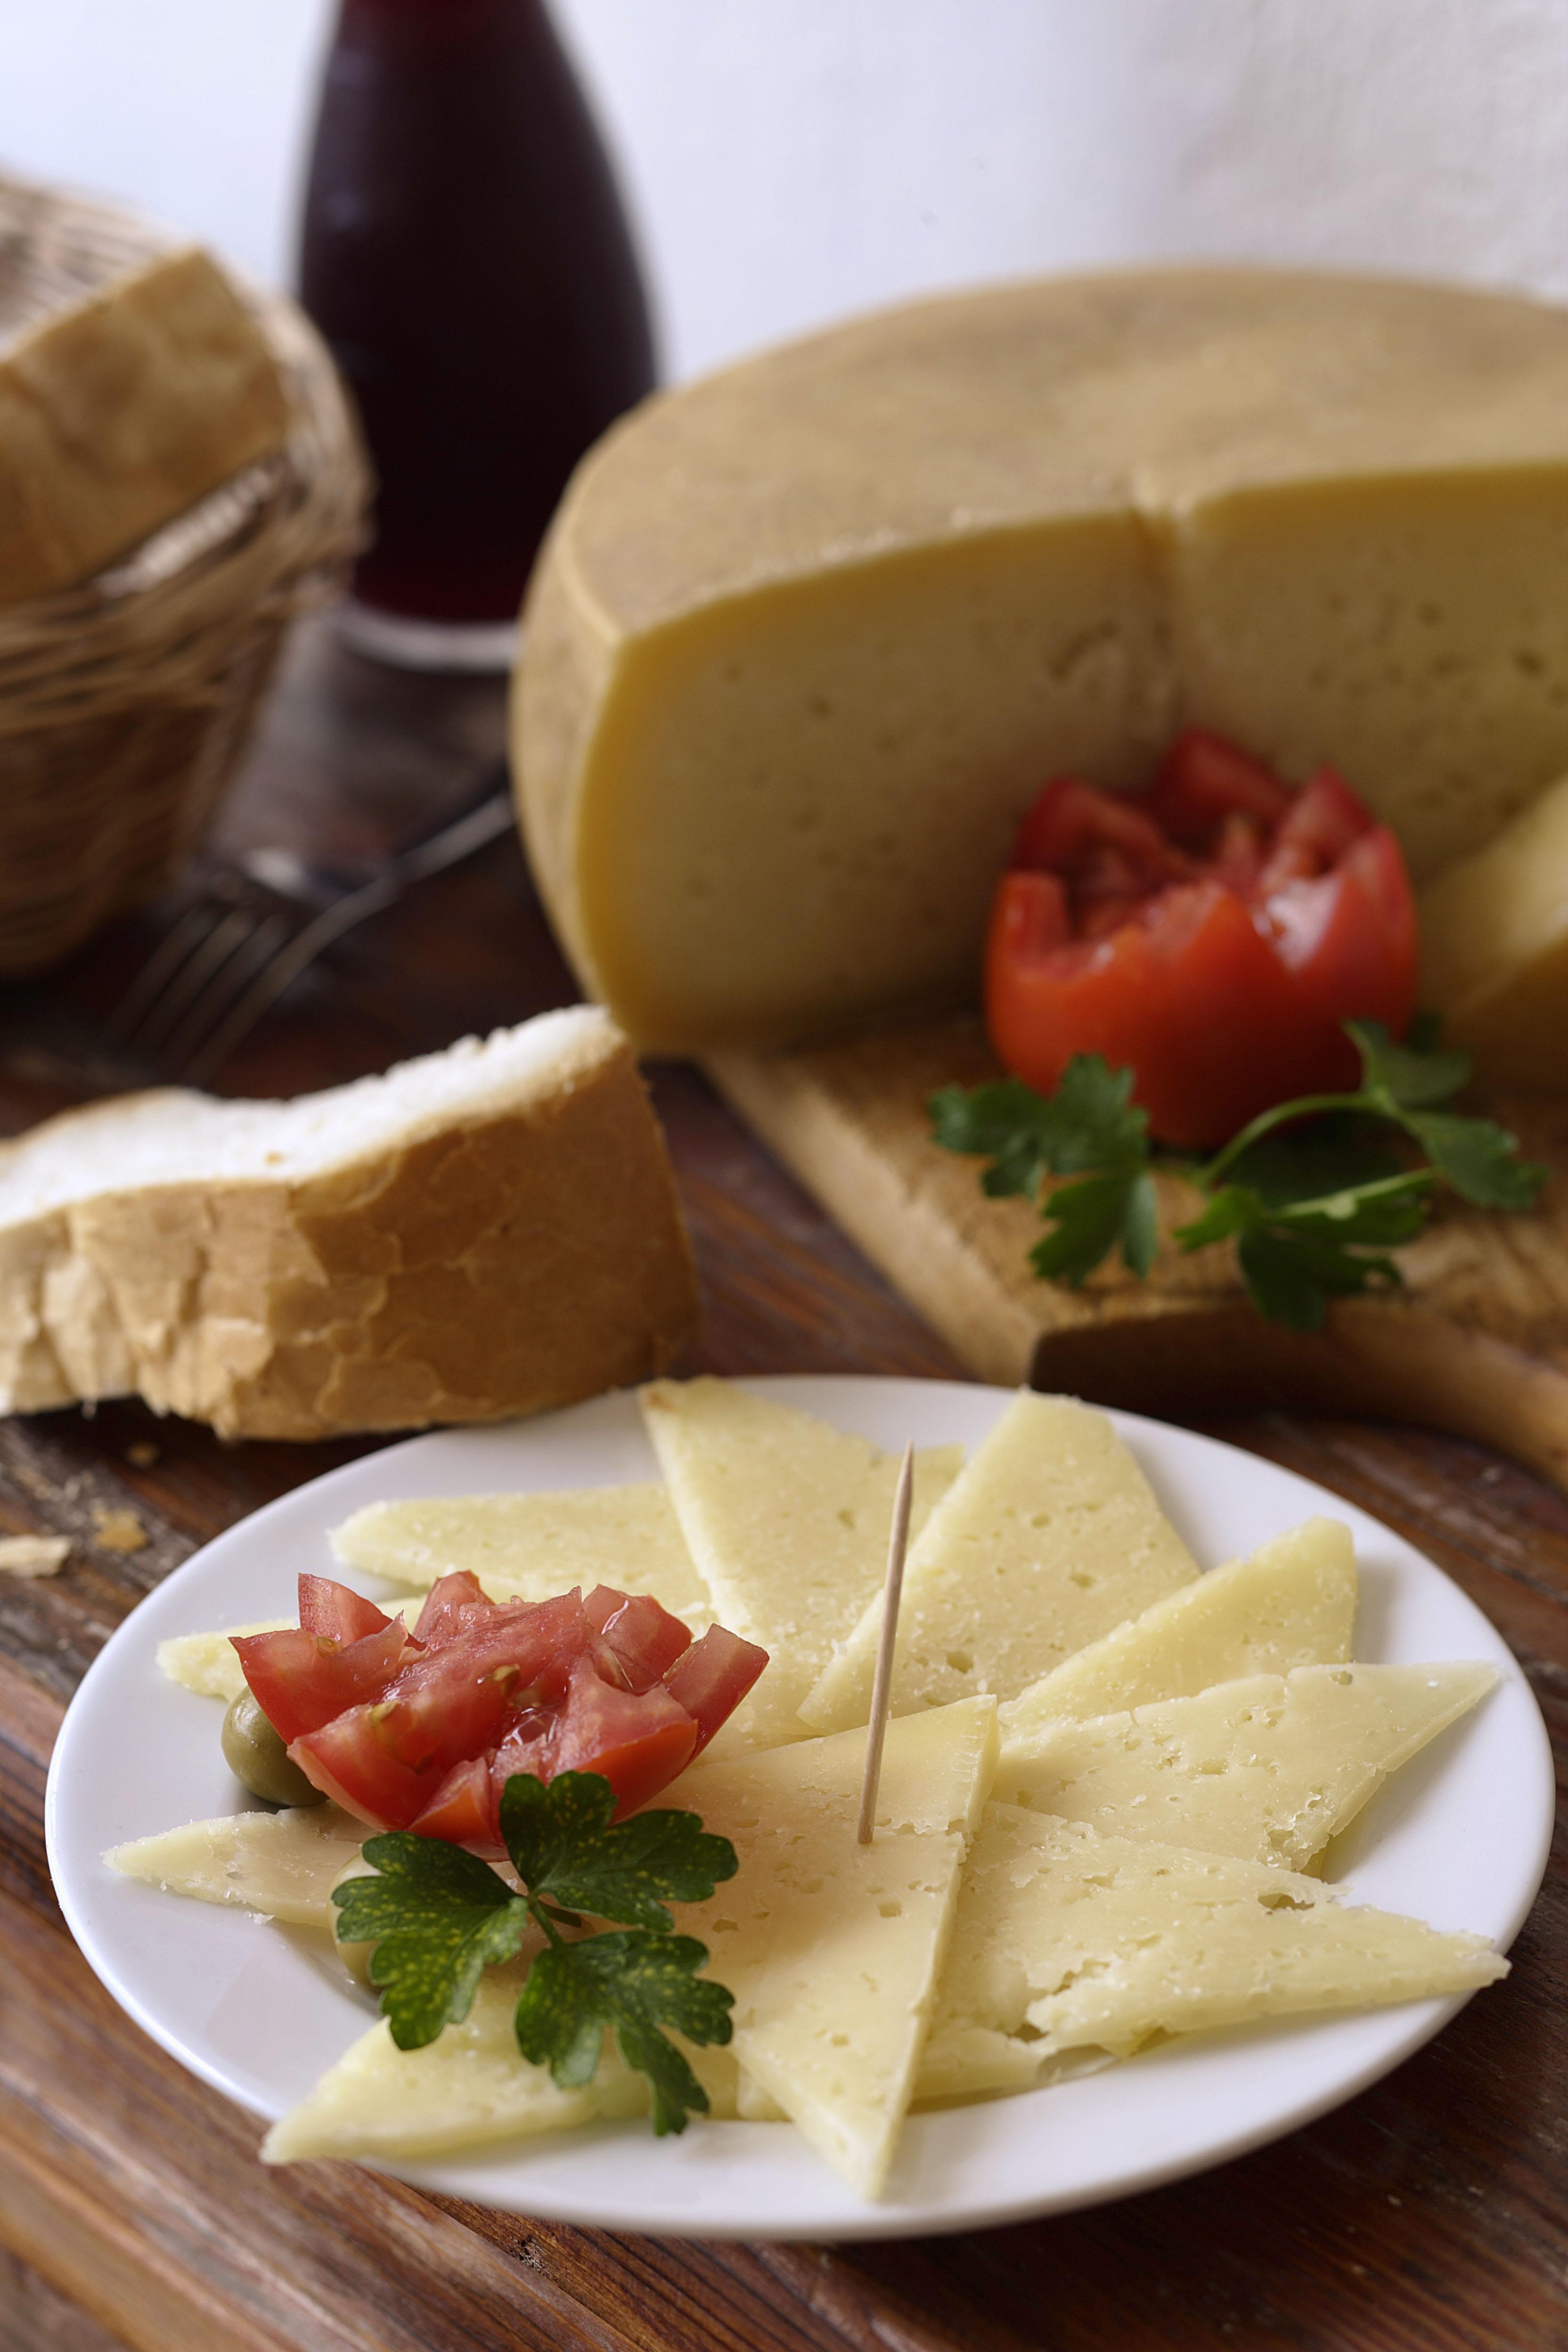 Paški sir, cheese from Pag Island in Croatia.